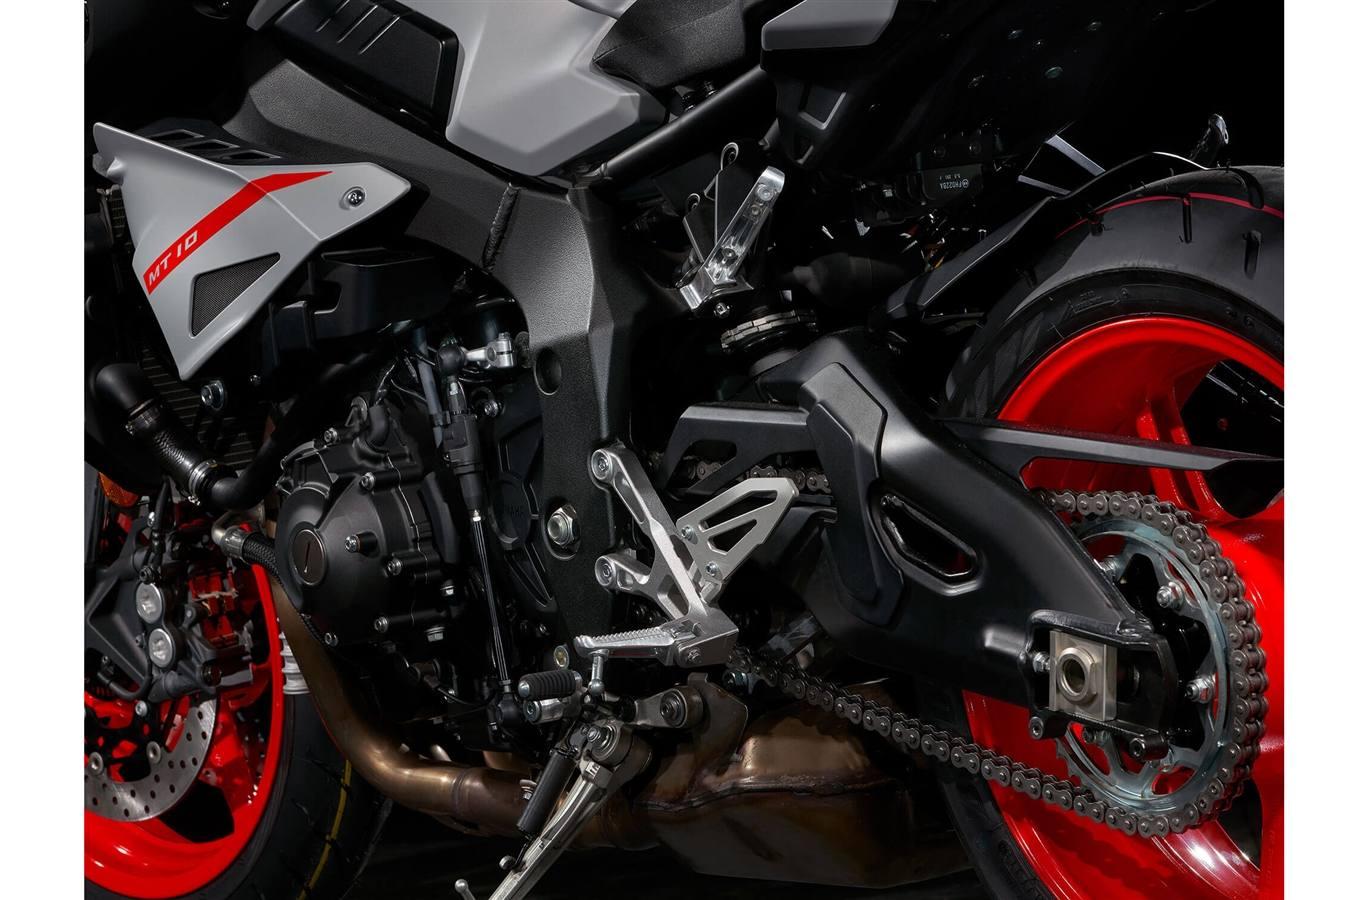 2019 Yamaha MT-10 - Matte Light Gray